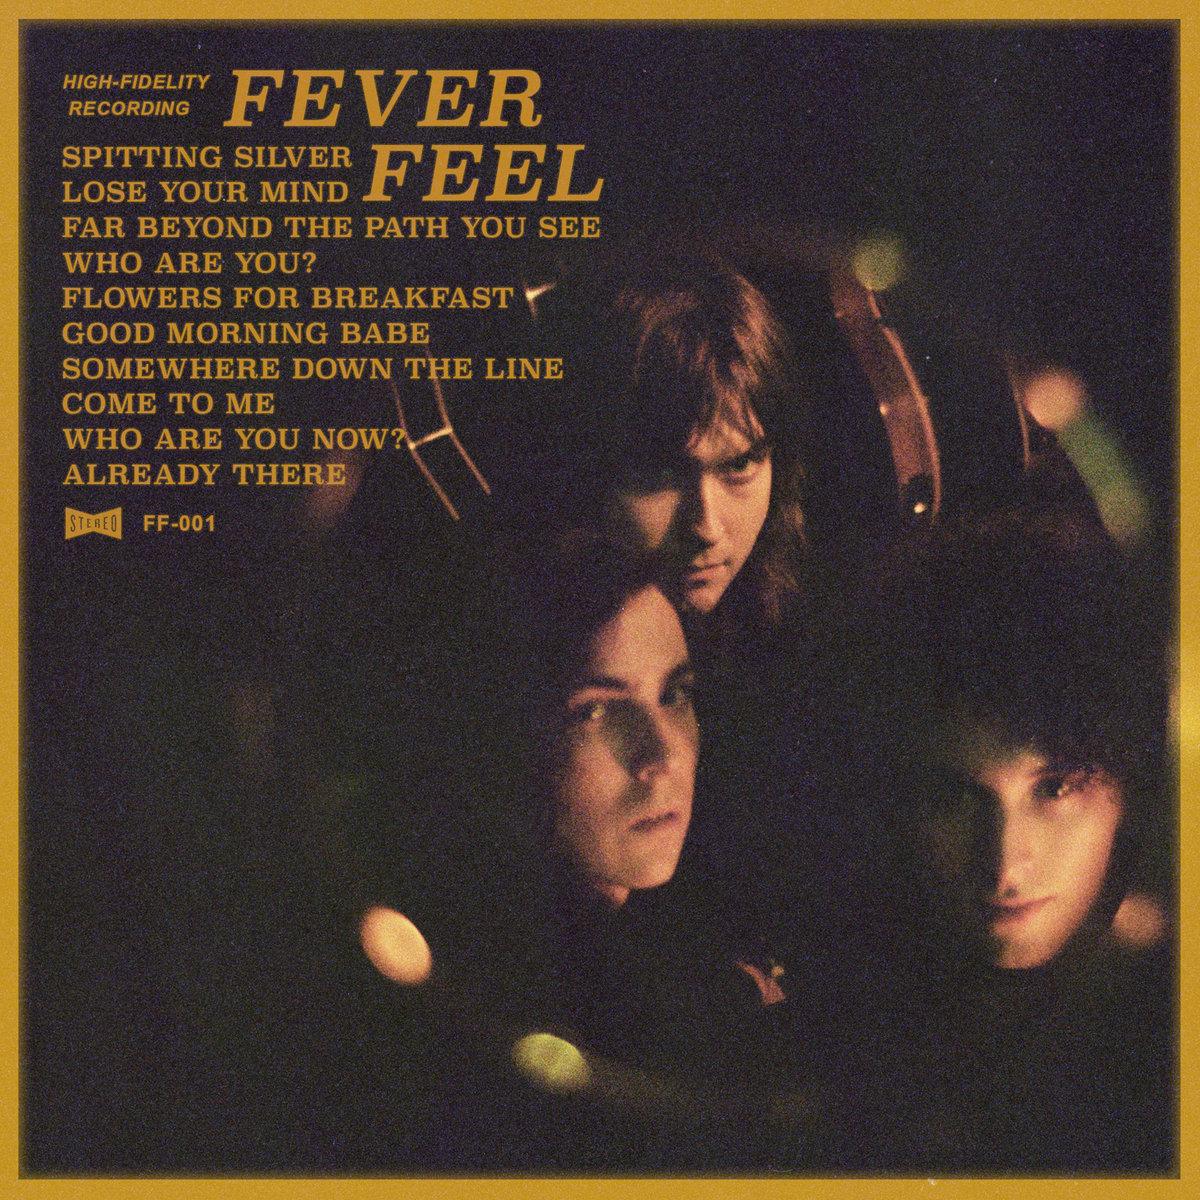 FeverFeel.jpg